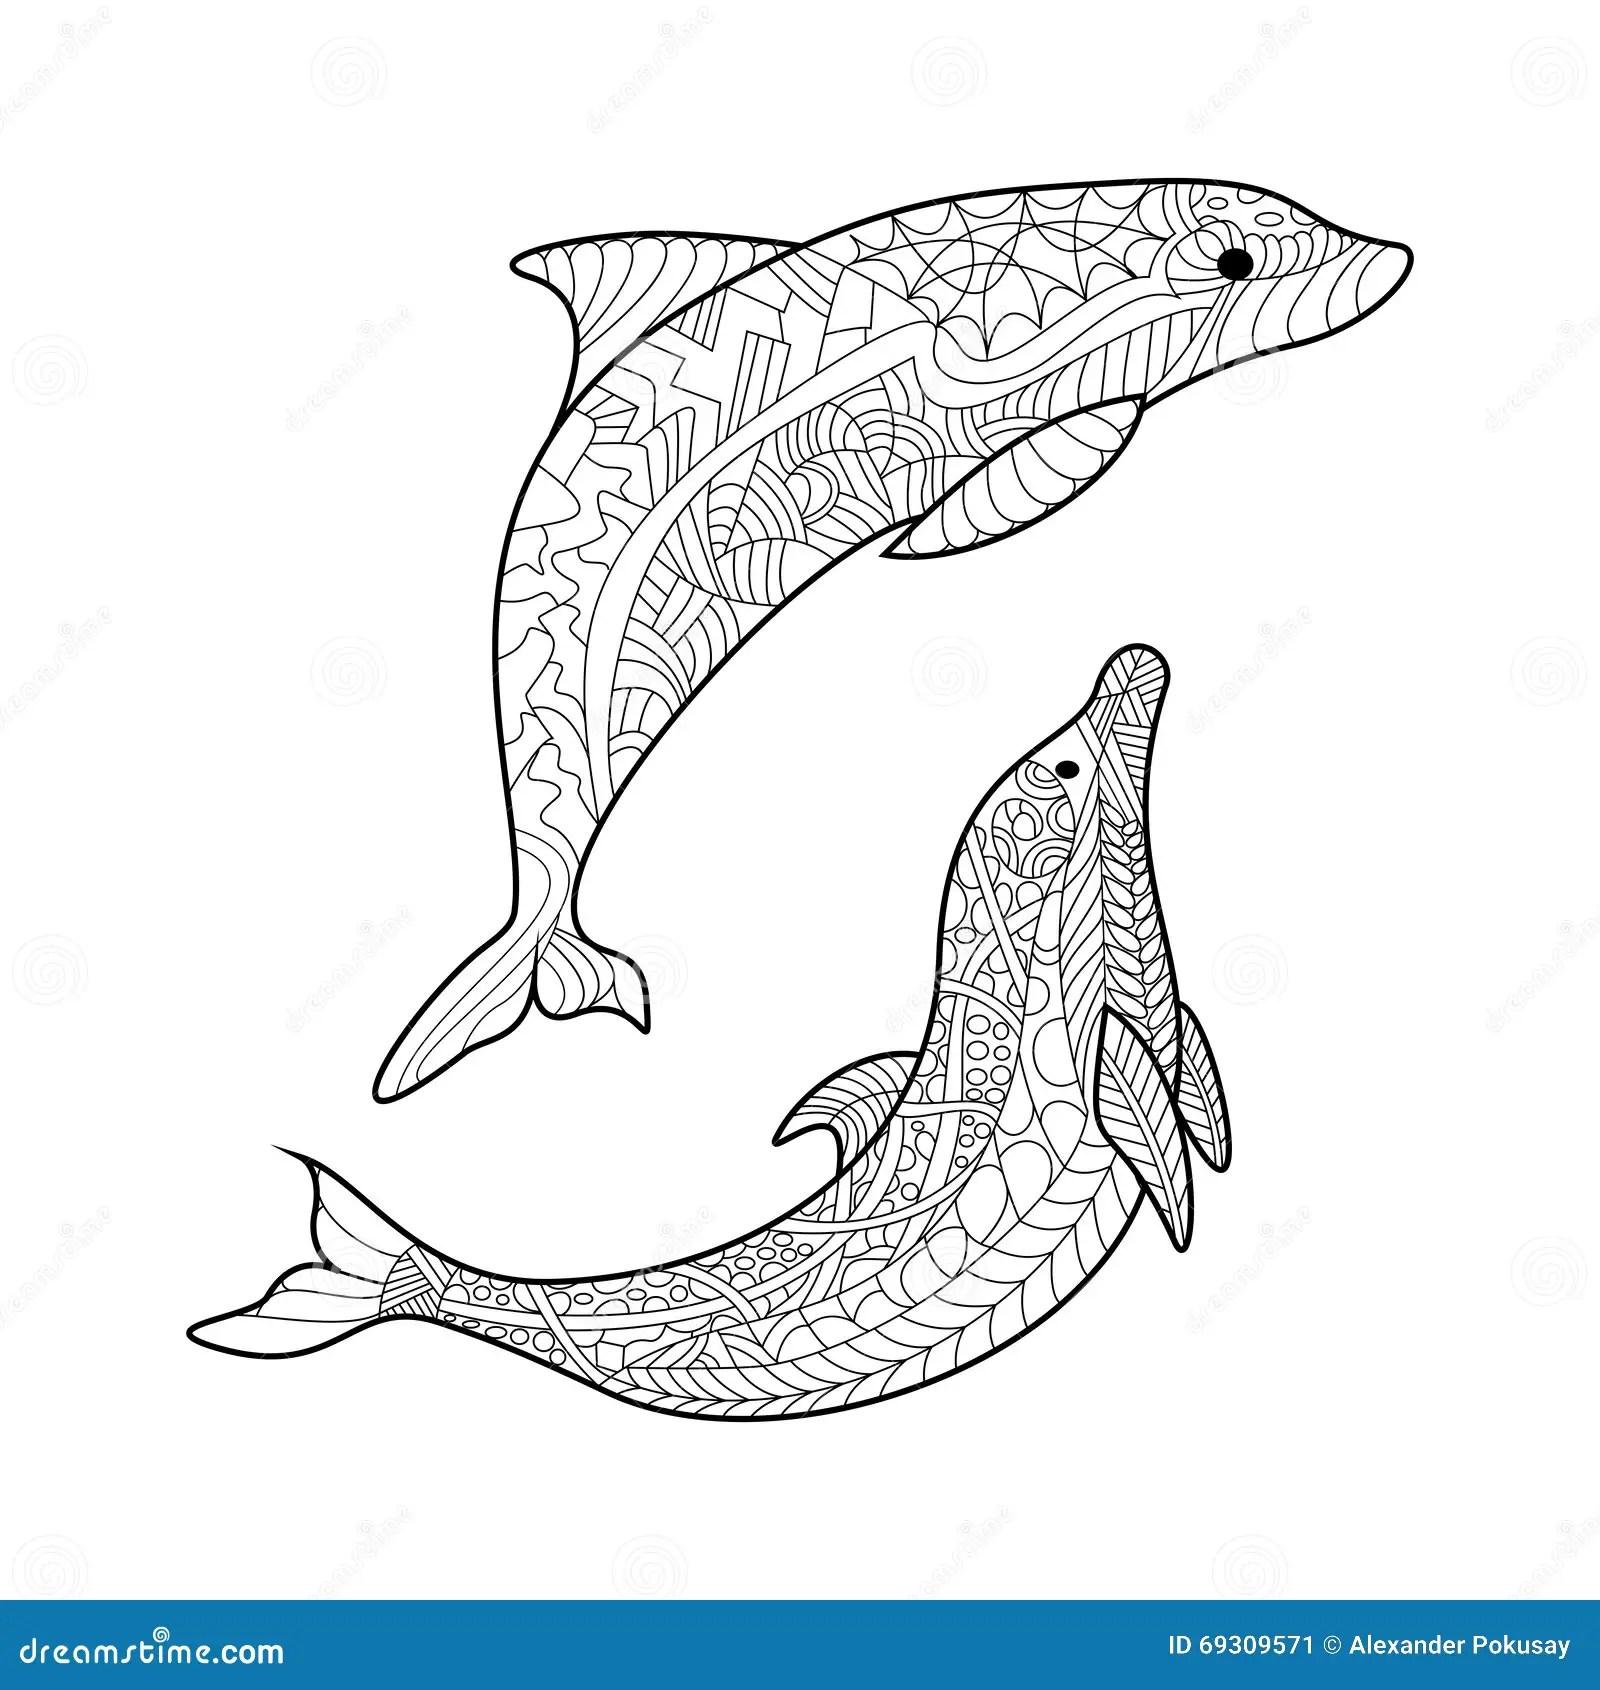 coloriage adulte dauphin